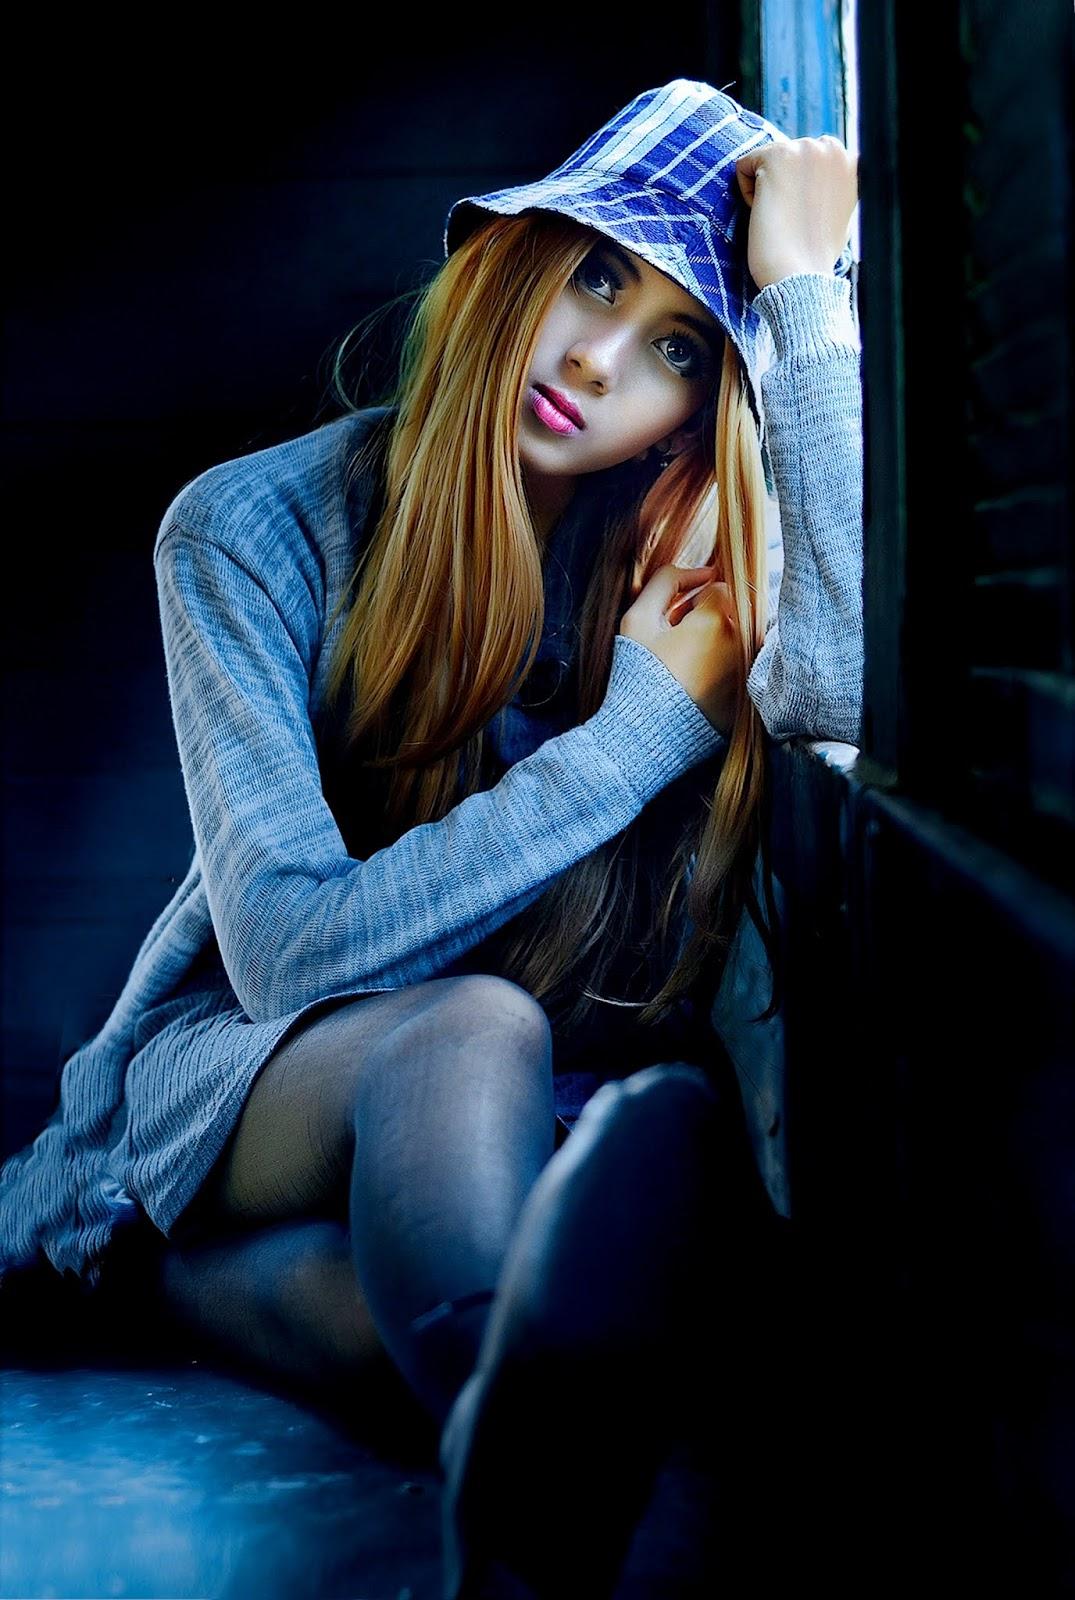 Sad Girl Alone DP for Facebook Profile